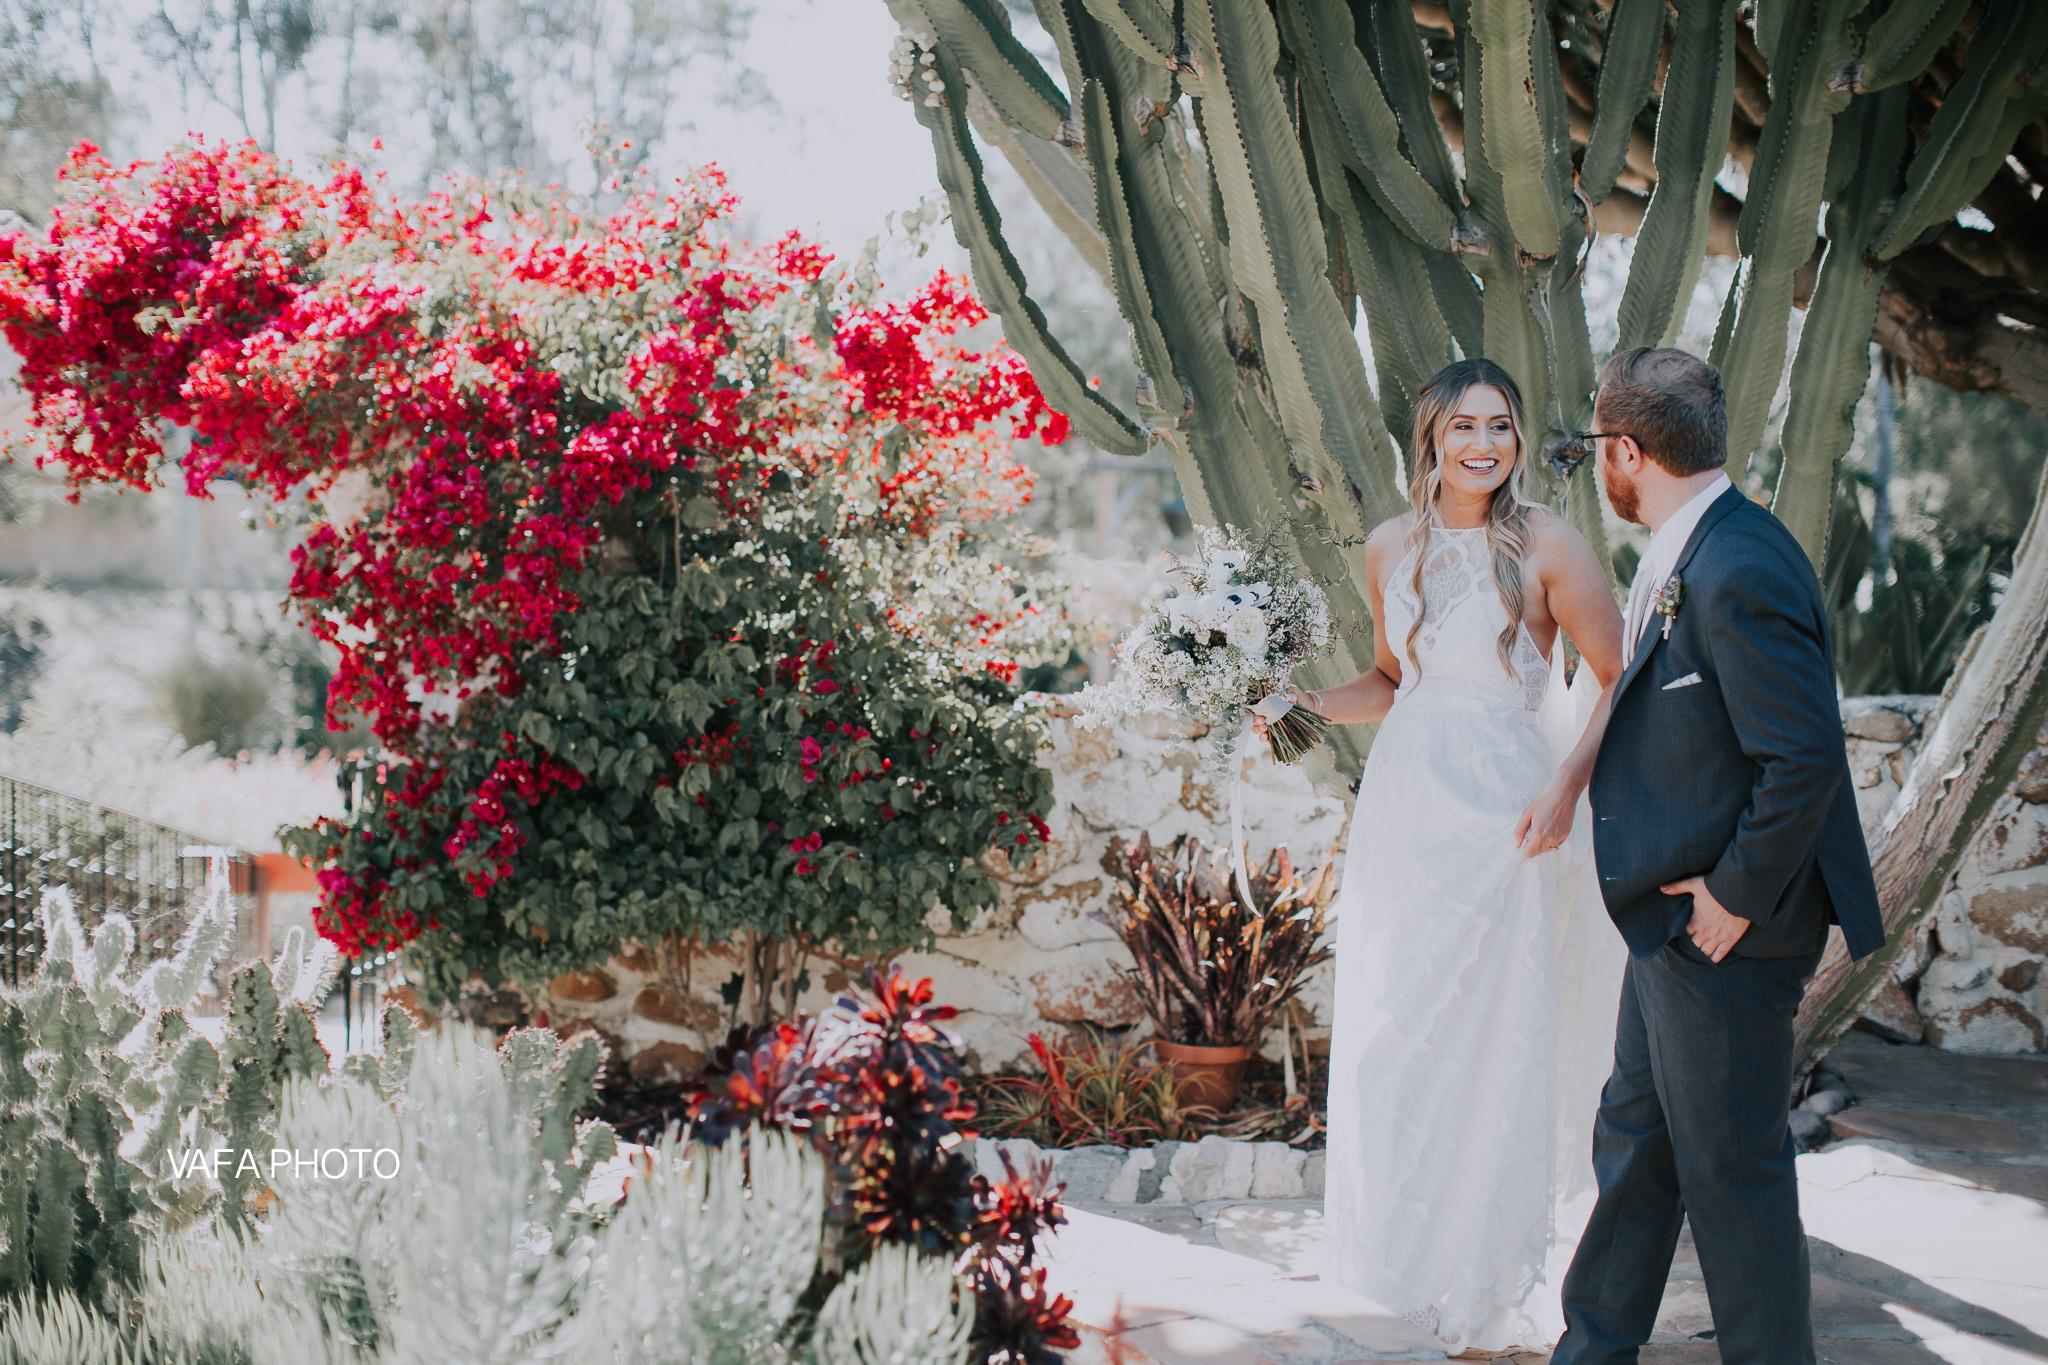 Leo-Carrillo-Ranch-Wedding-Lauren-Mike-Vafa-Photo-299.jpg